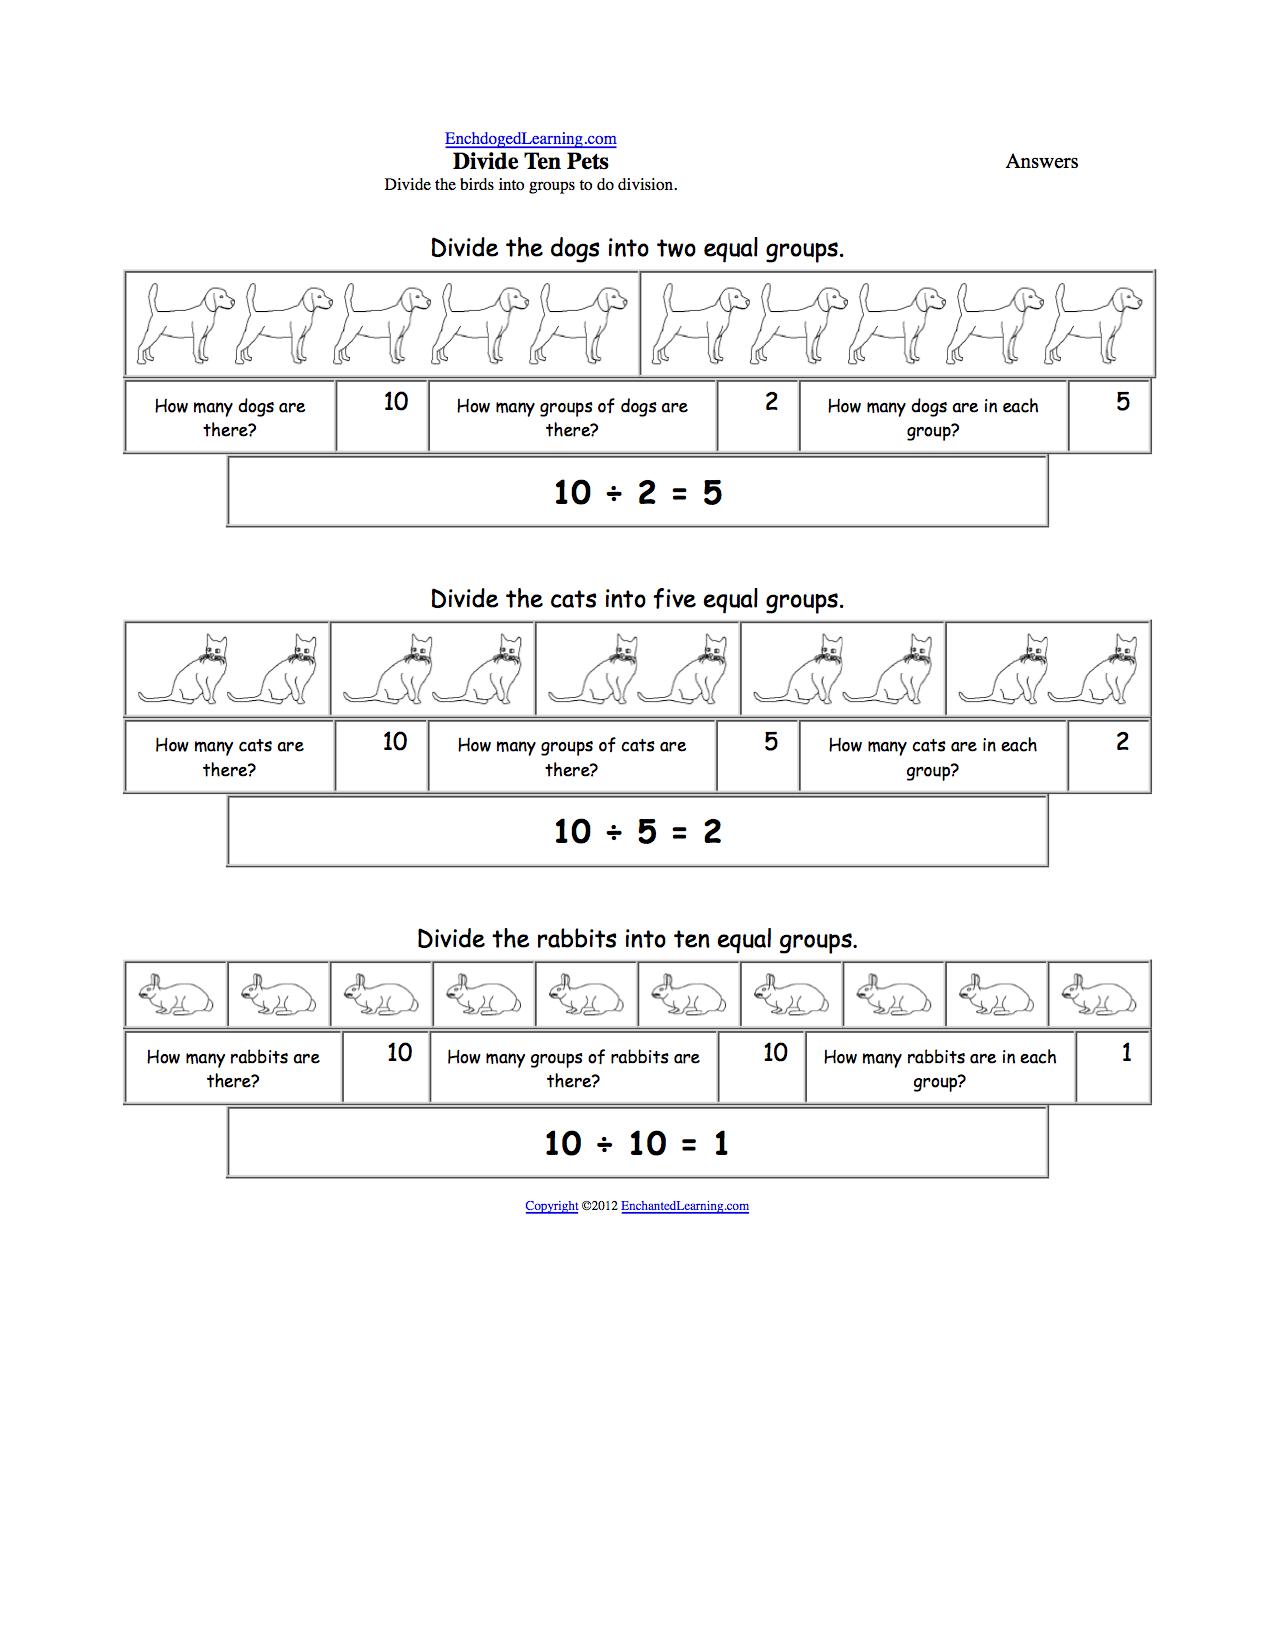 Worksheets Making Groups Of 10 Worksheets division enchantedlearning com